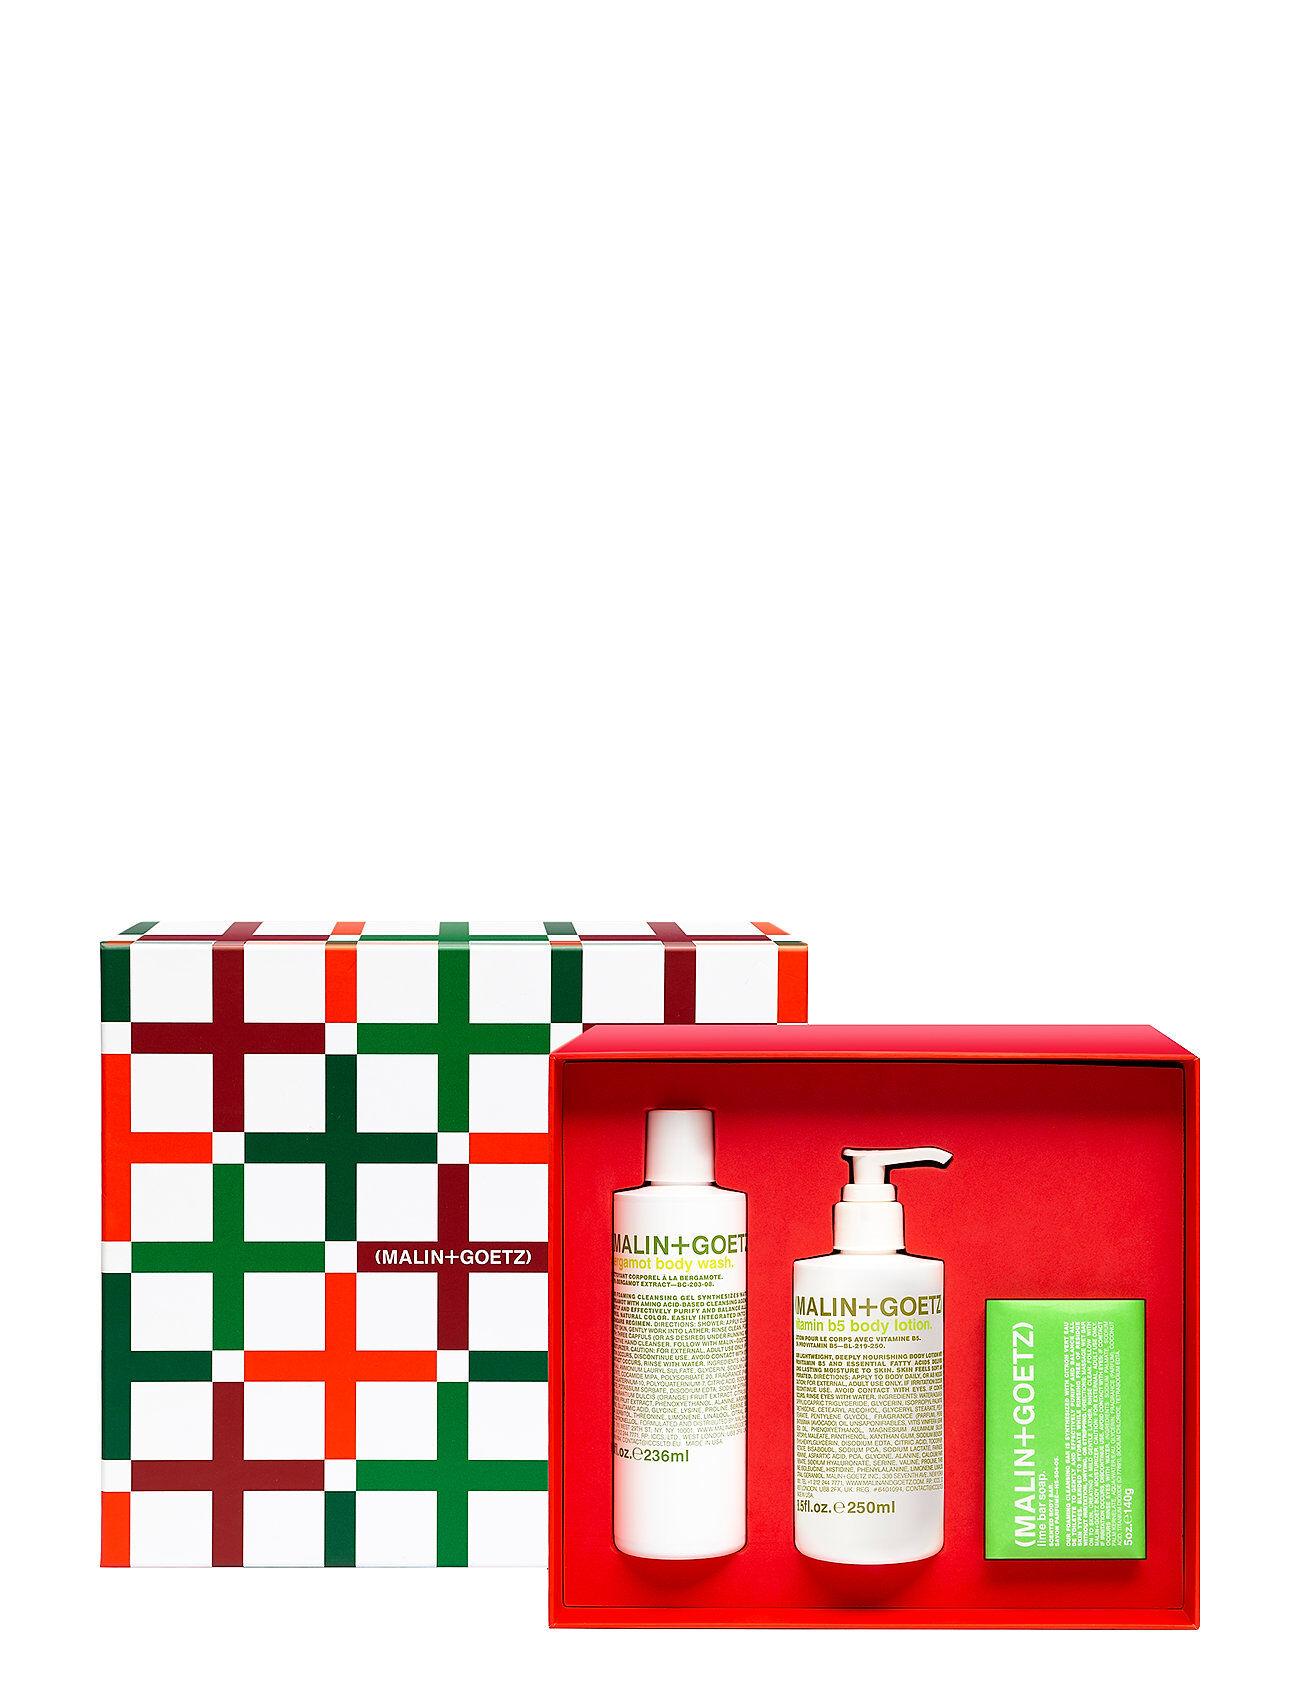 MALIN+GOETZ Body Essentials Beauty WOMEN Skin Care Bath & Body Sets Body Care Creams & Lotions & Bodybutter Nude MALIN+GOETZ